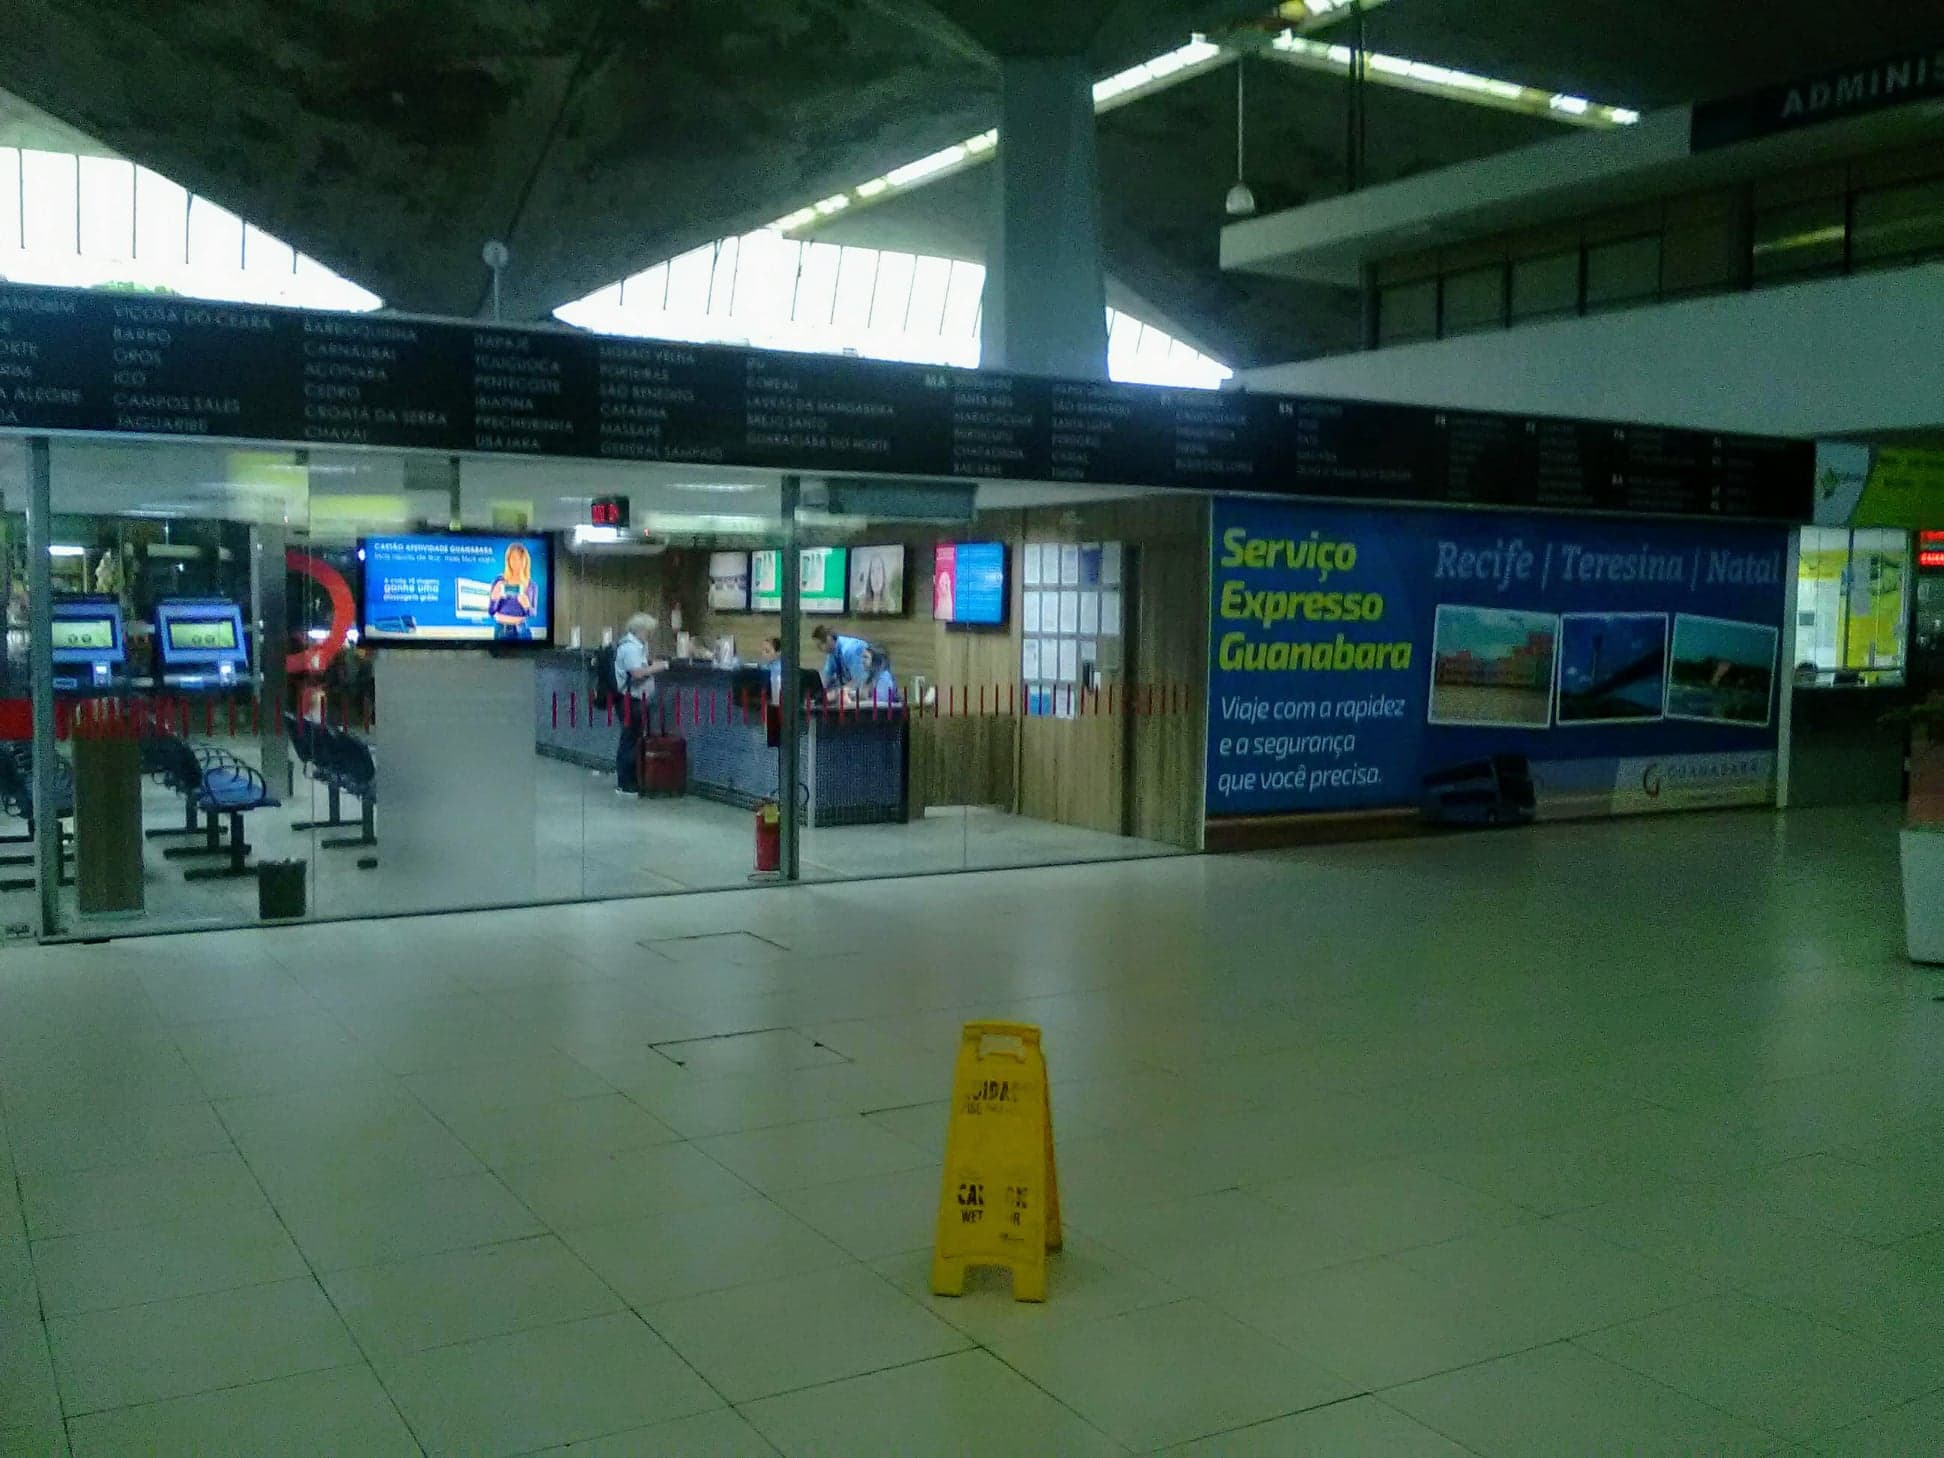 Bustation-hier-begint-de-reis-van-37-uur-naar-Luis-Eduardo-Maghaeles